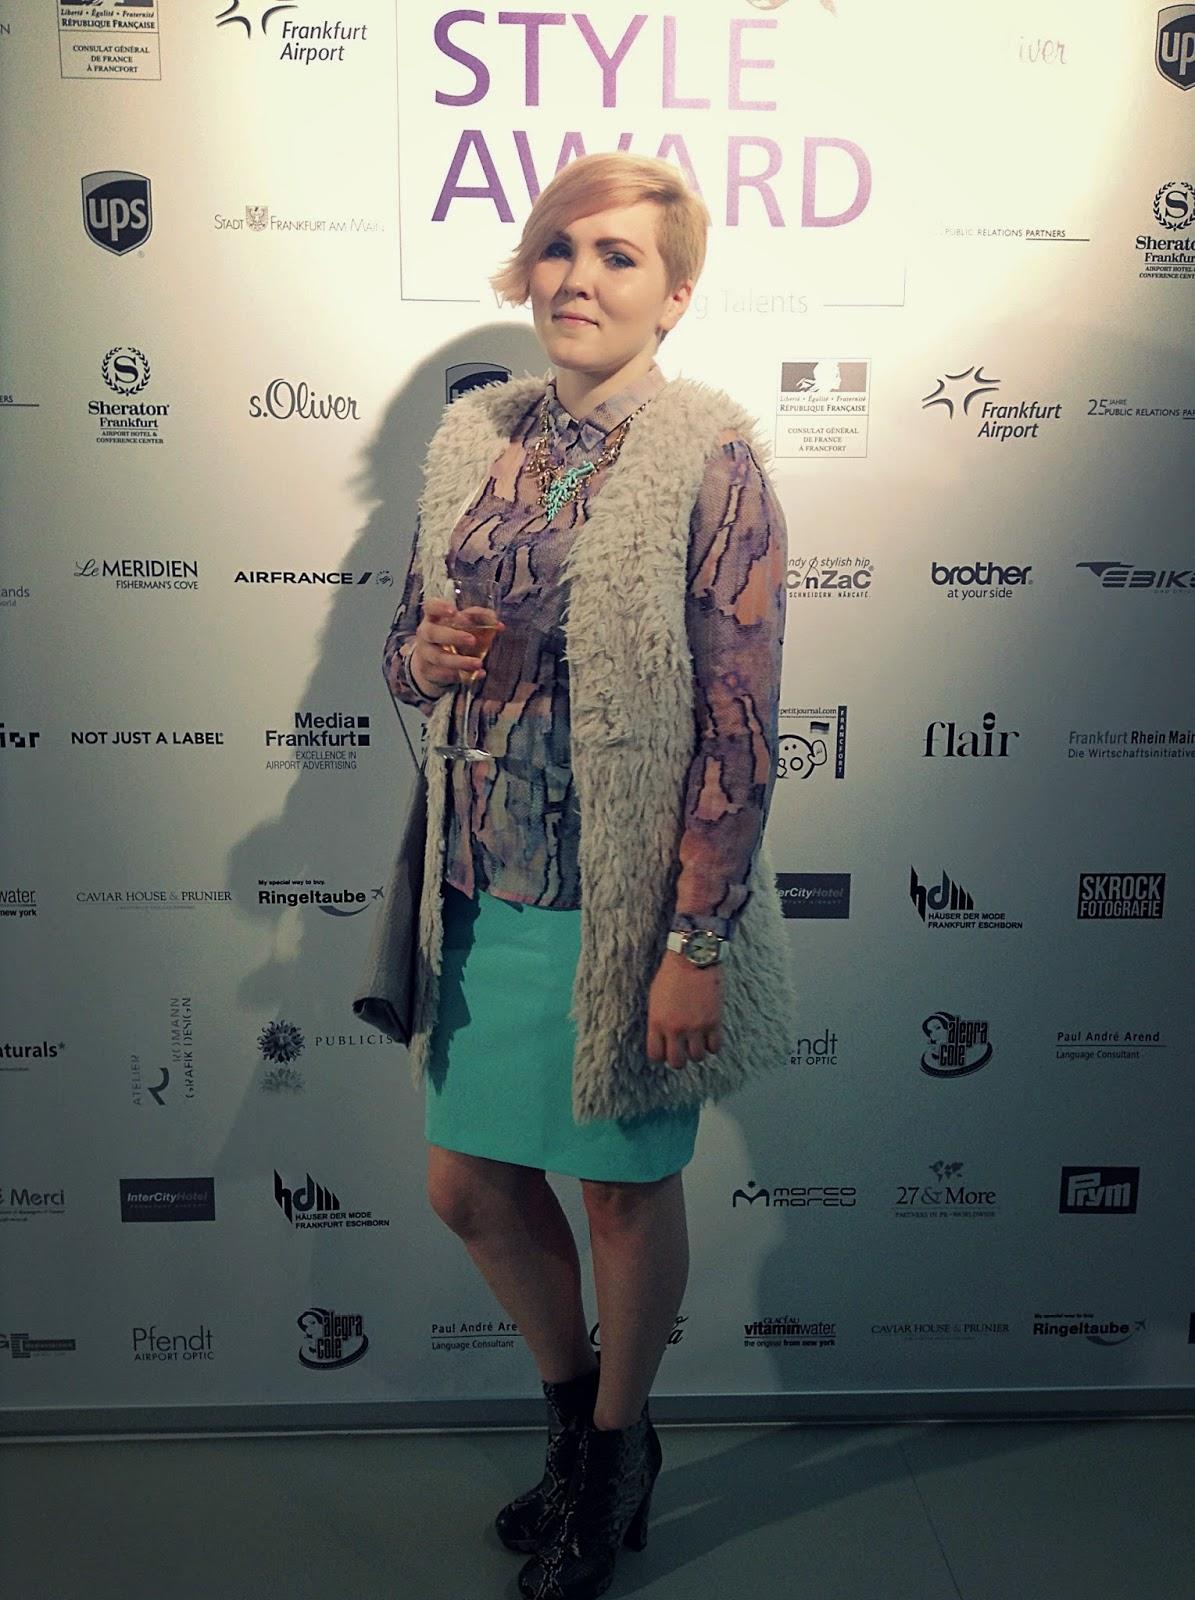 Frankfurt Style Awards 2014